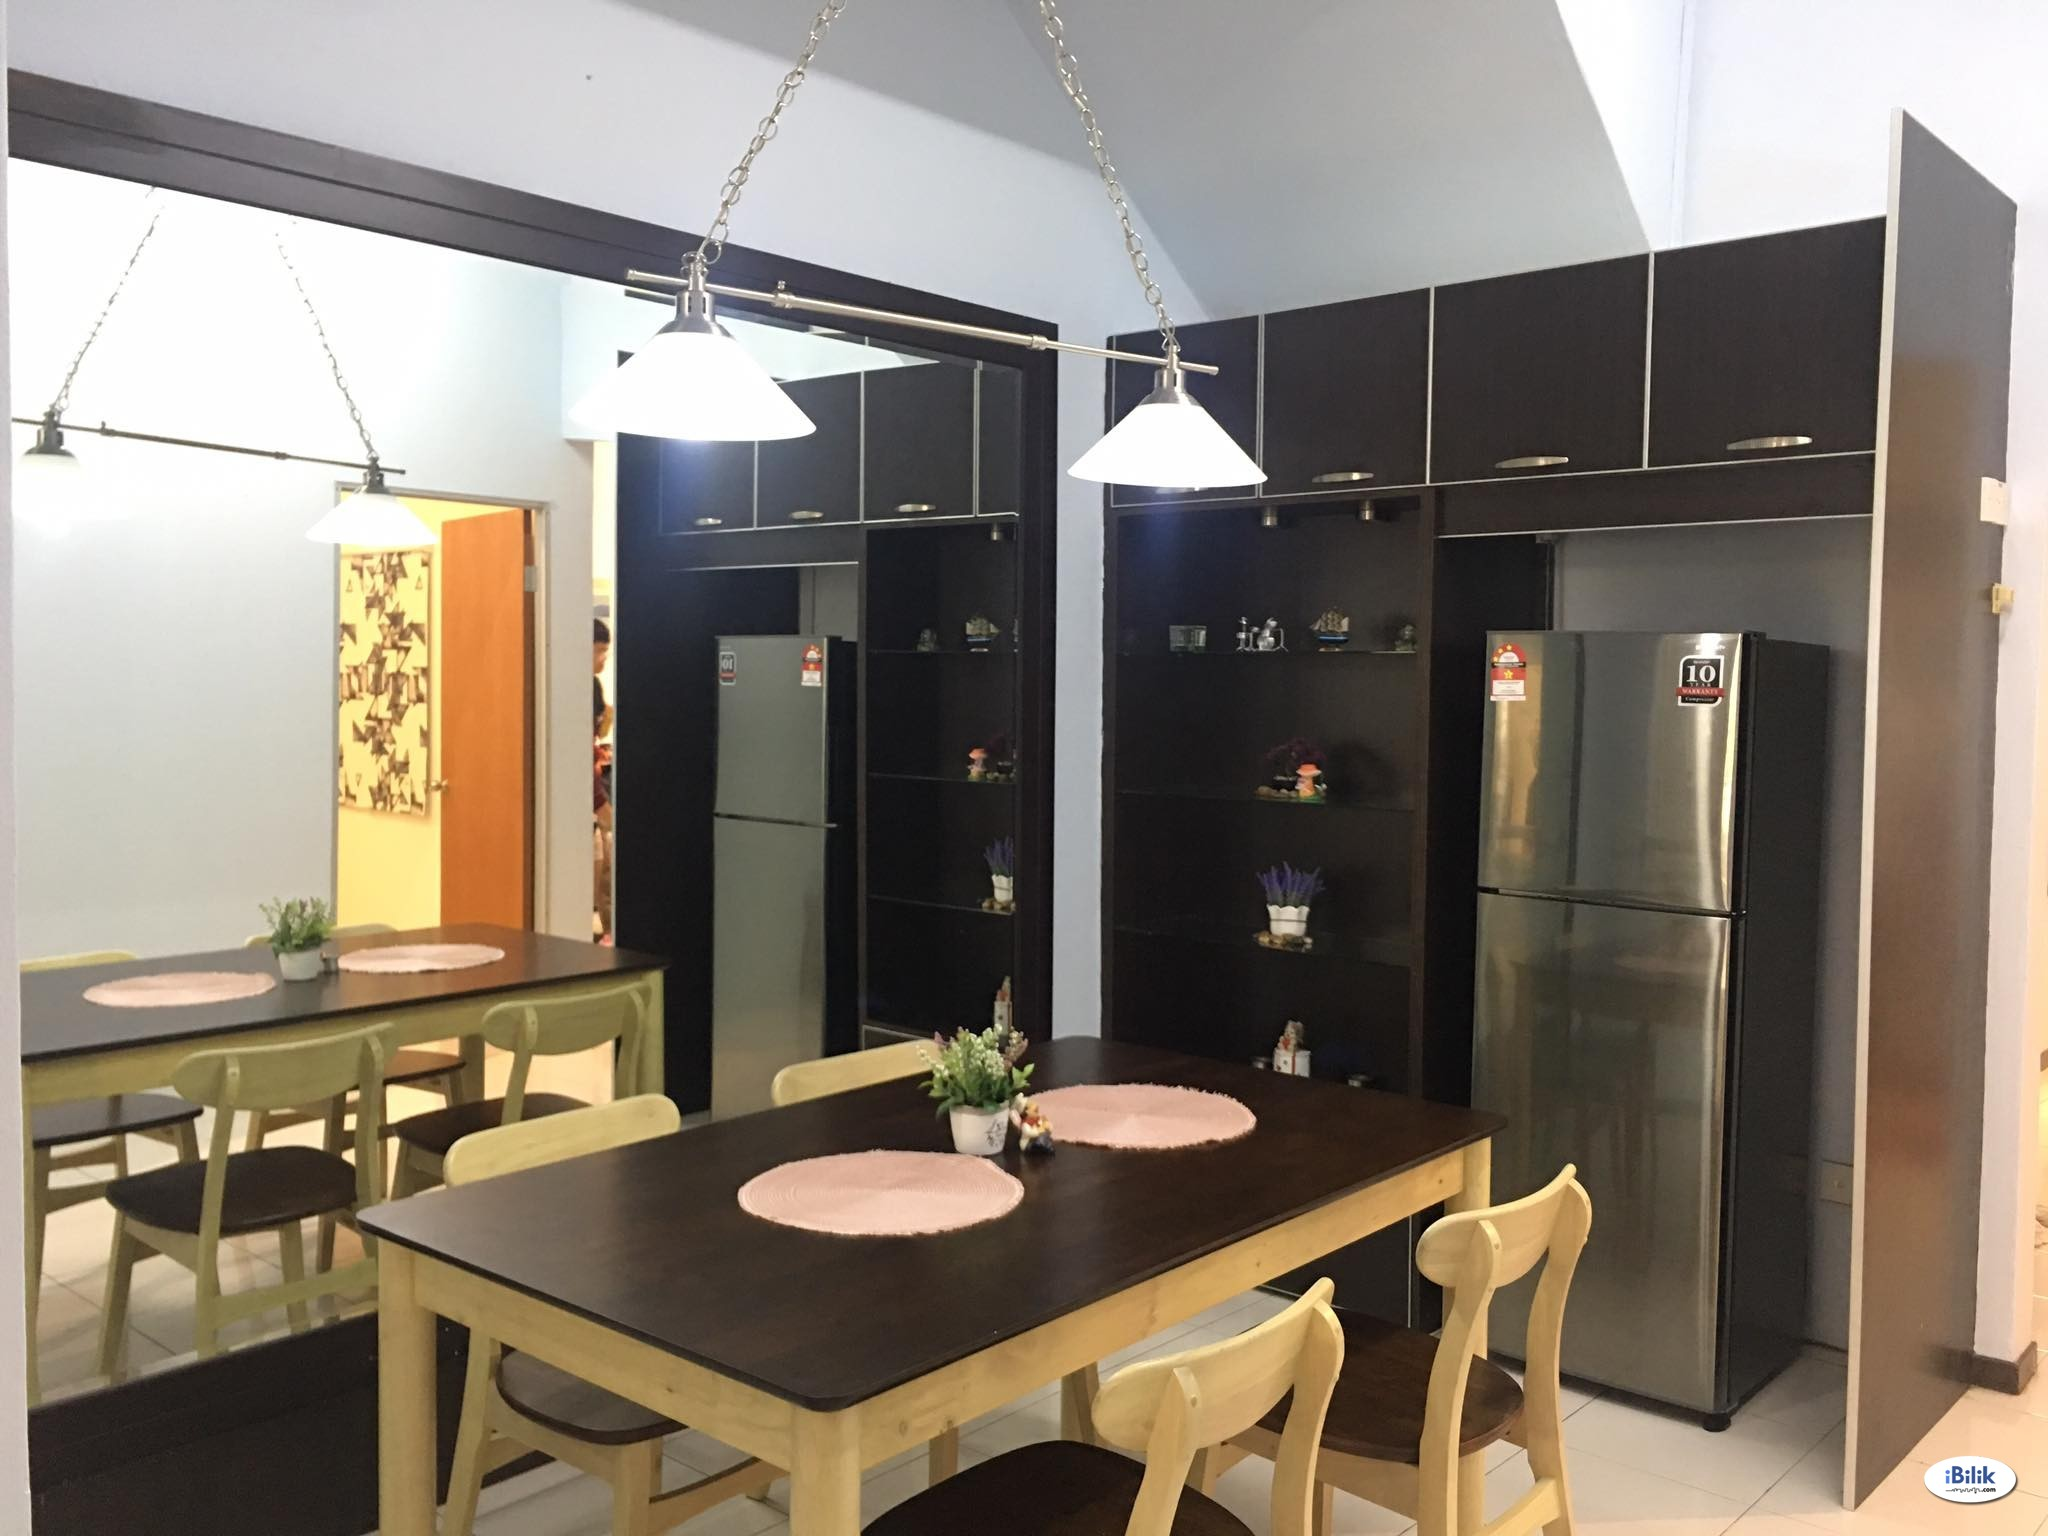 Single Room at Damansara Emas, Kota Damansara